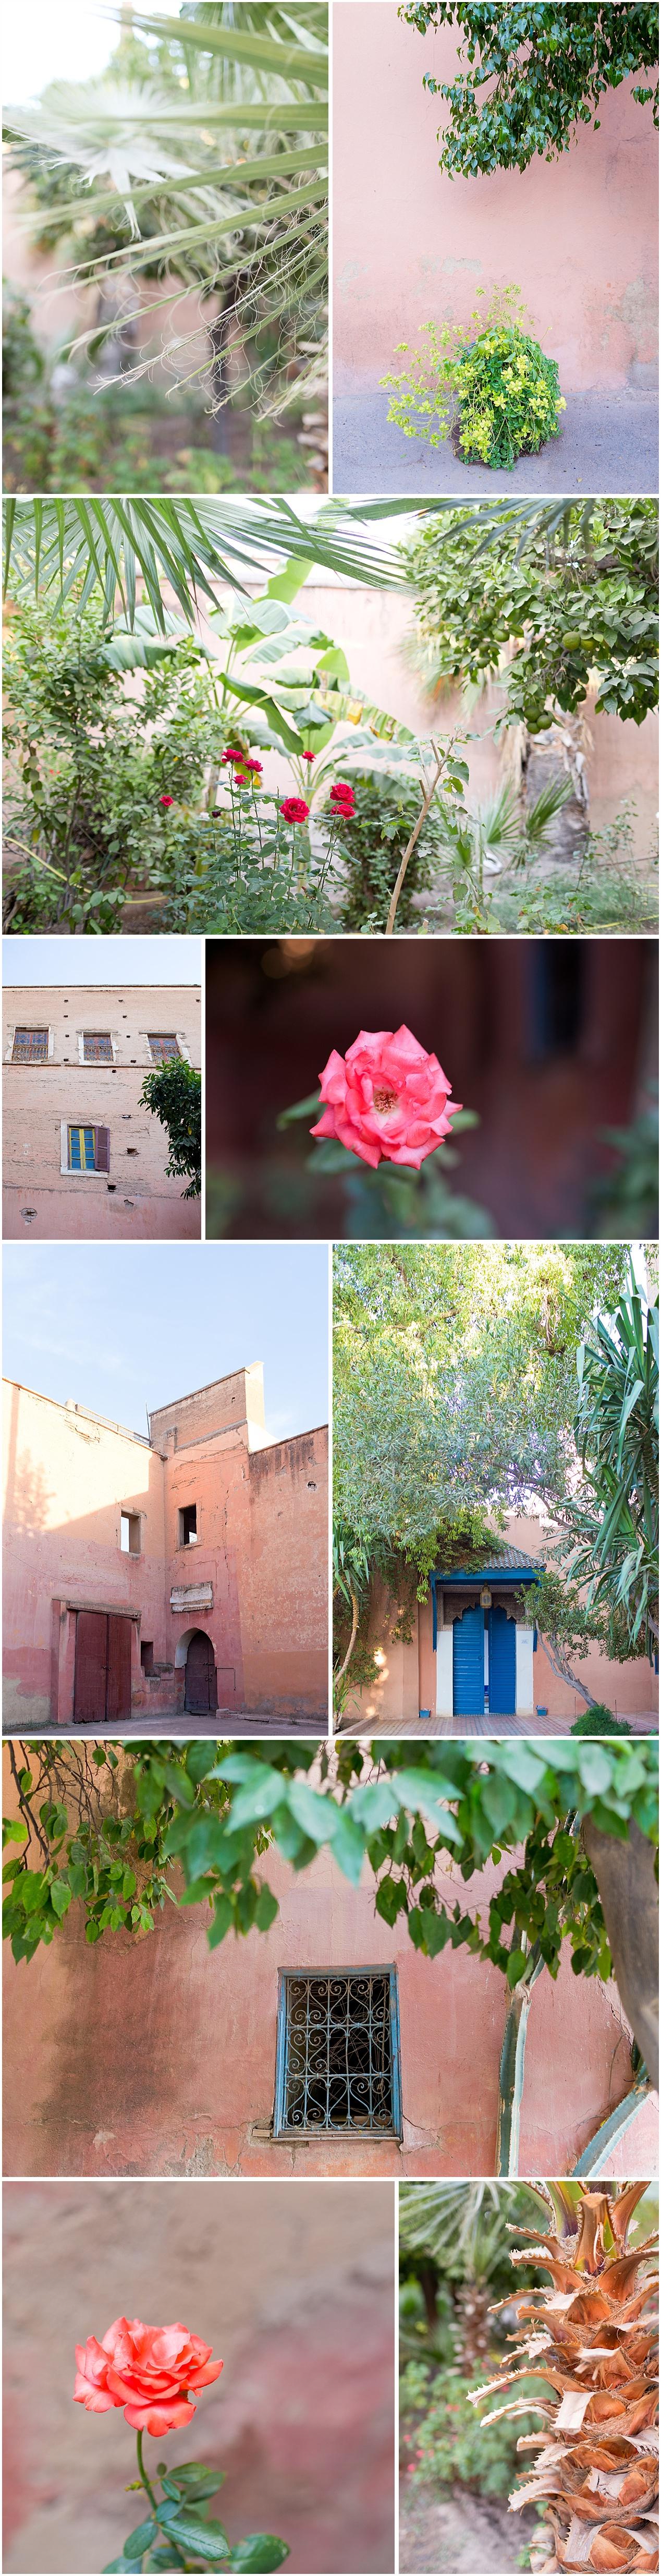 peaceful botanical gardens outside Bahia Palace in Marrakech, Morocco